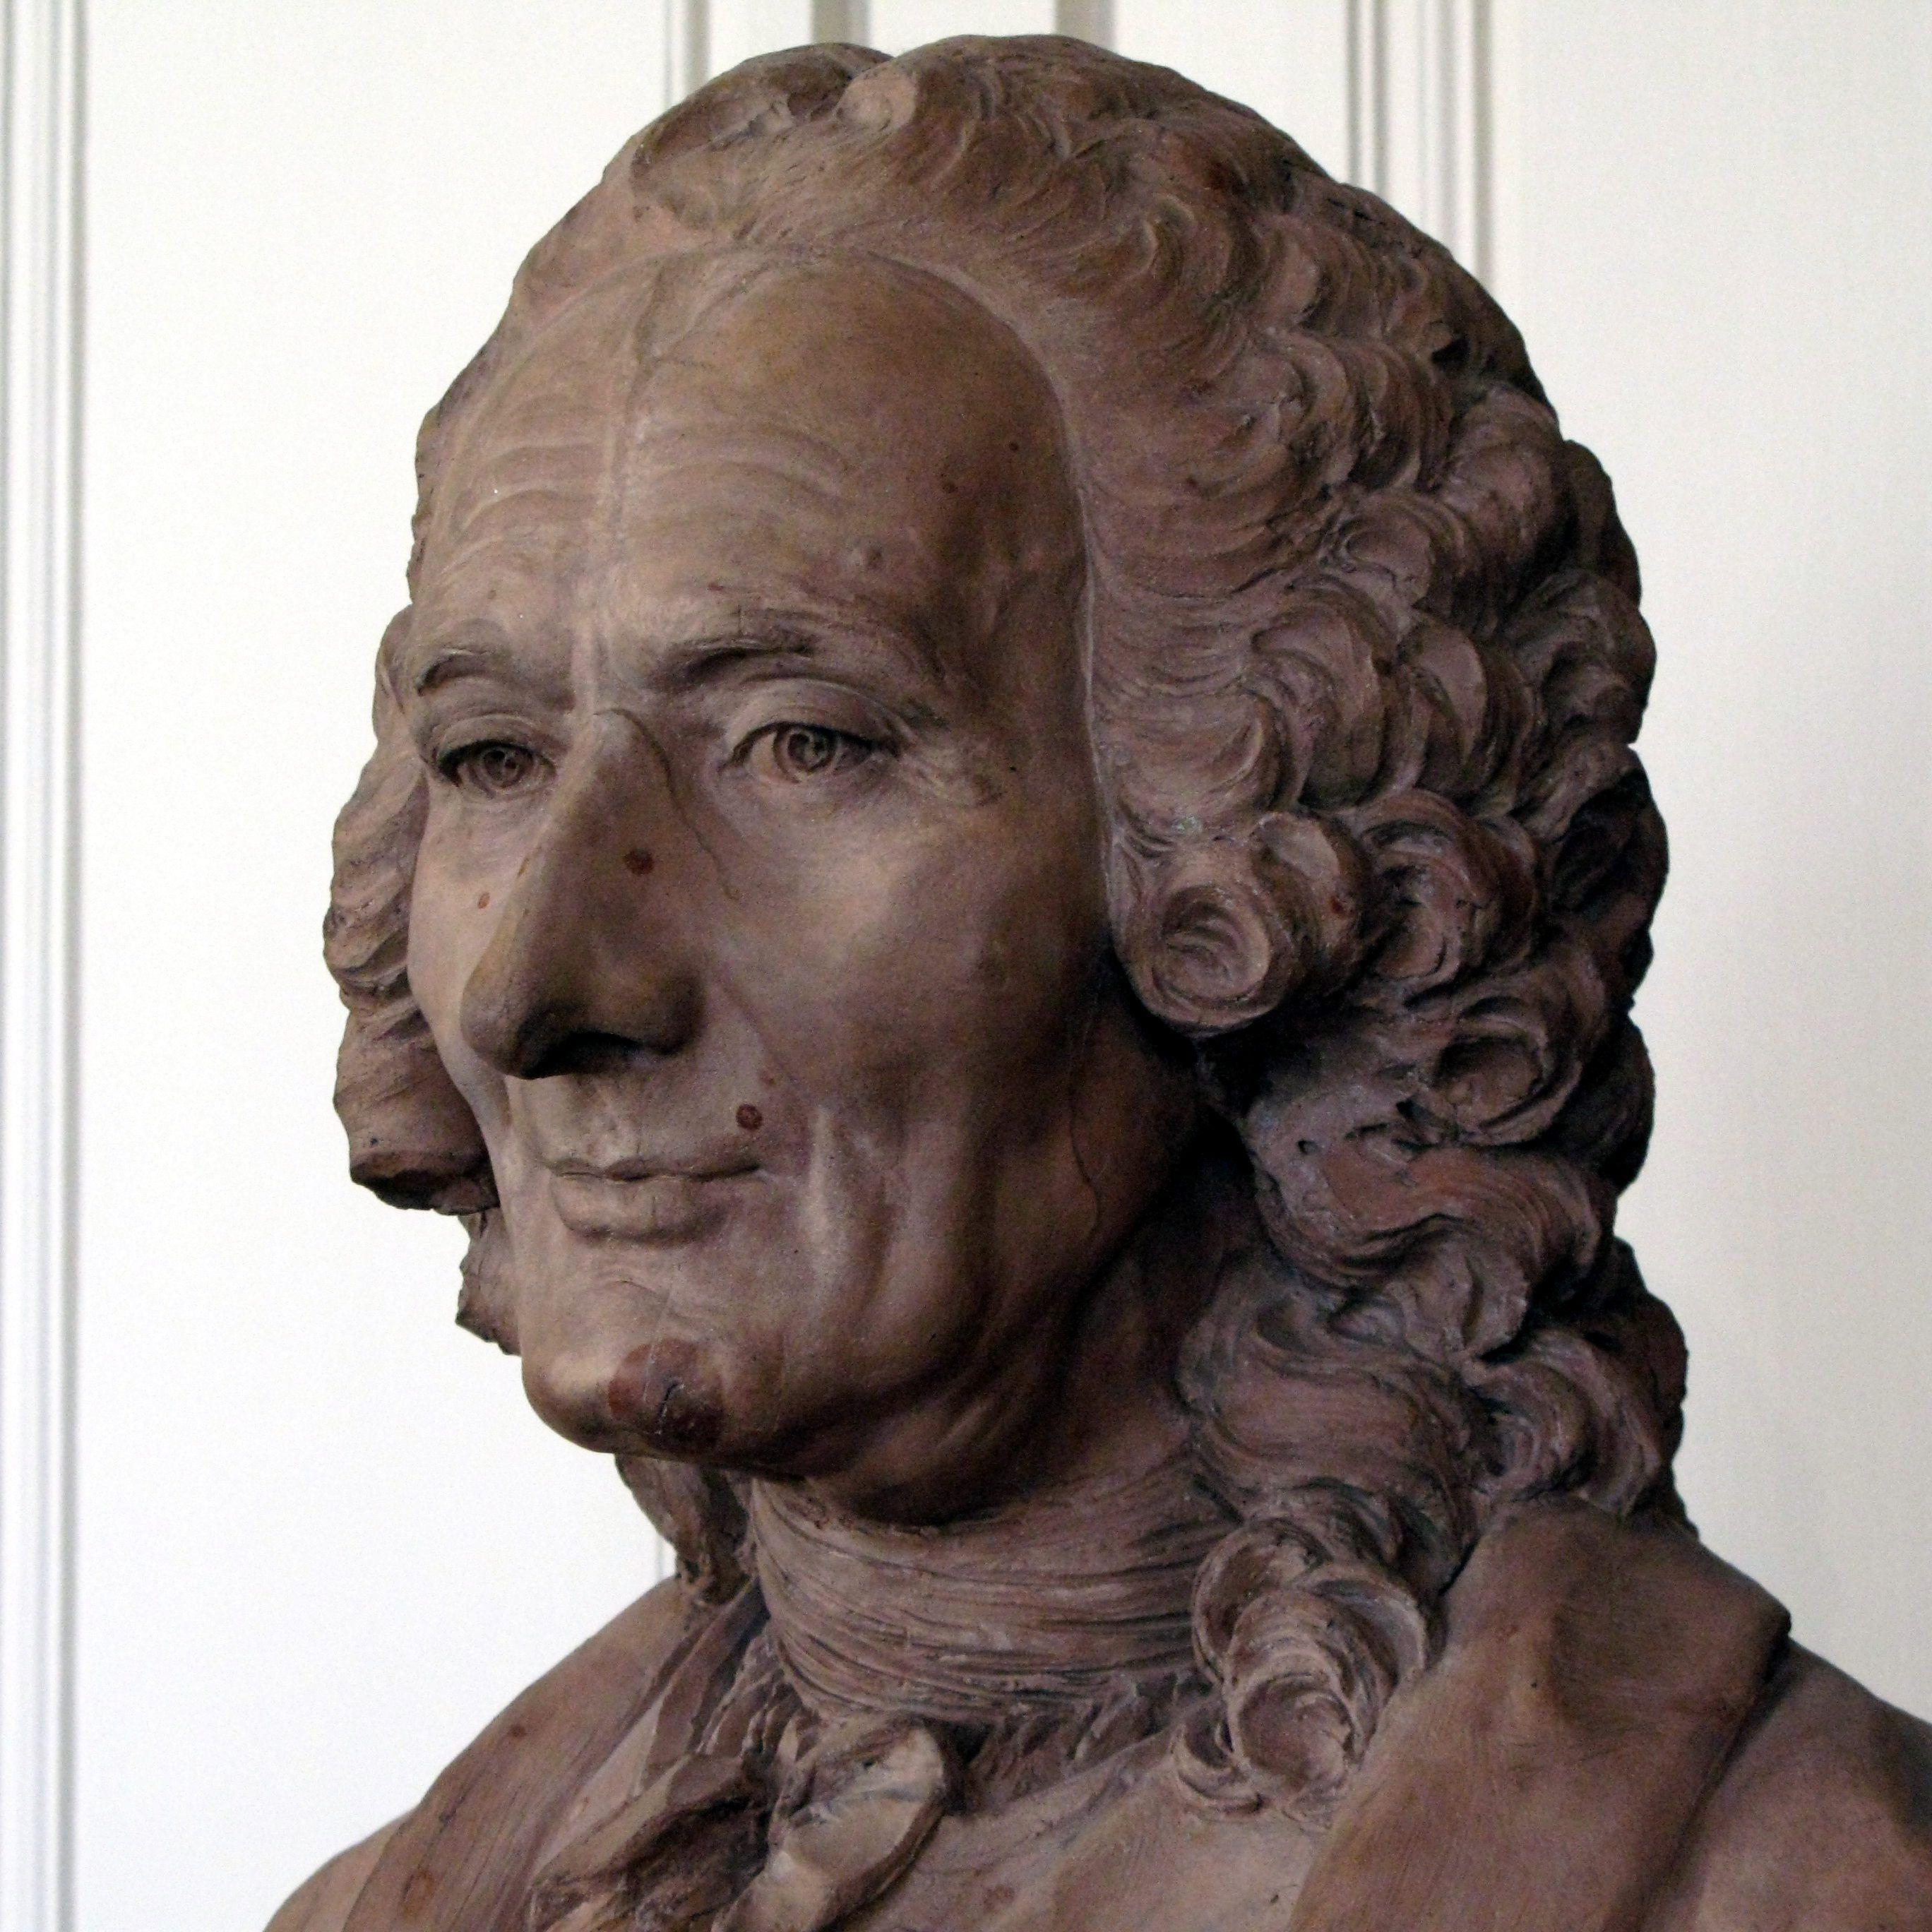 Bust of Rameau by Caffieri, 1760